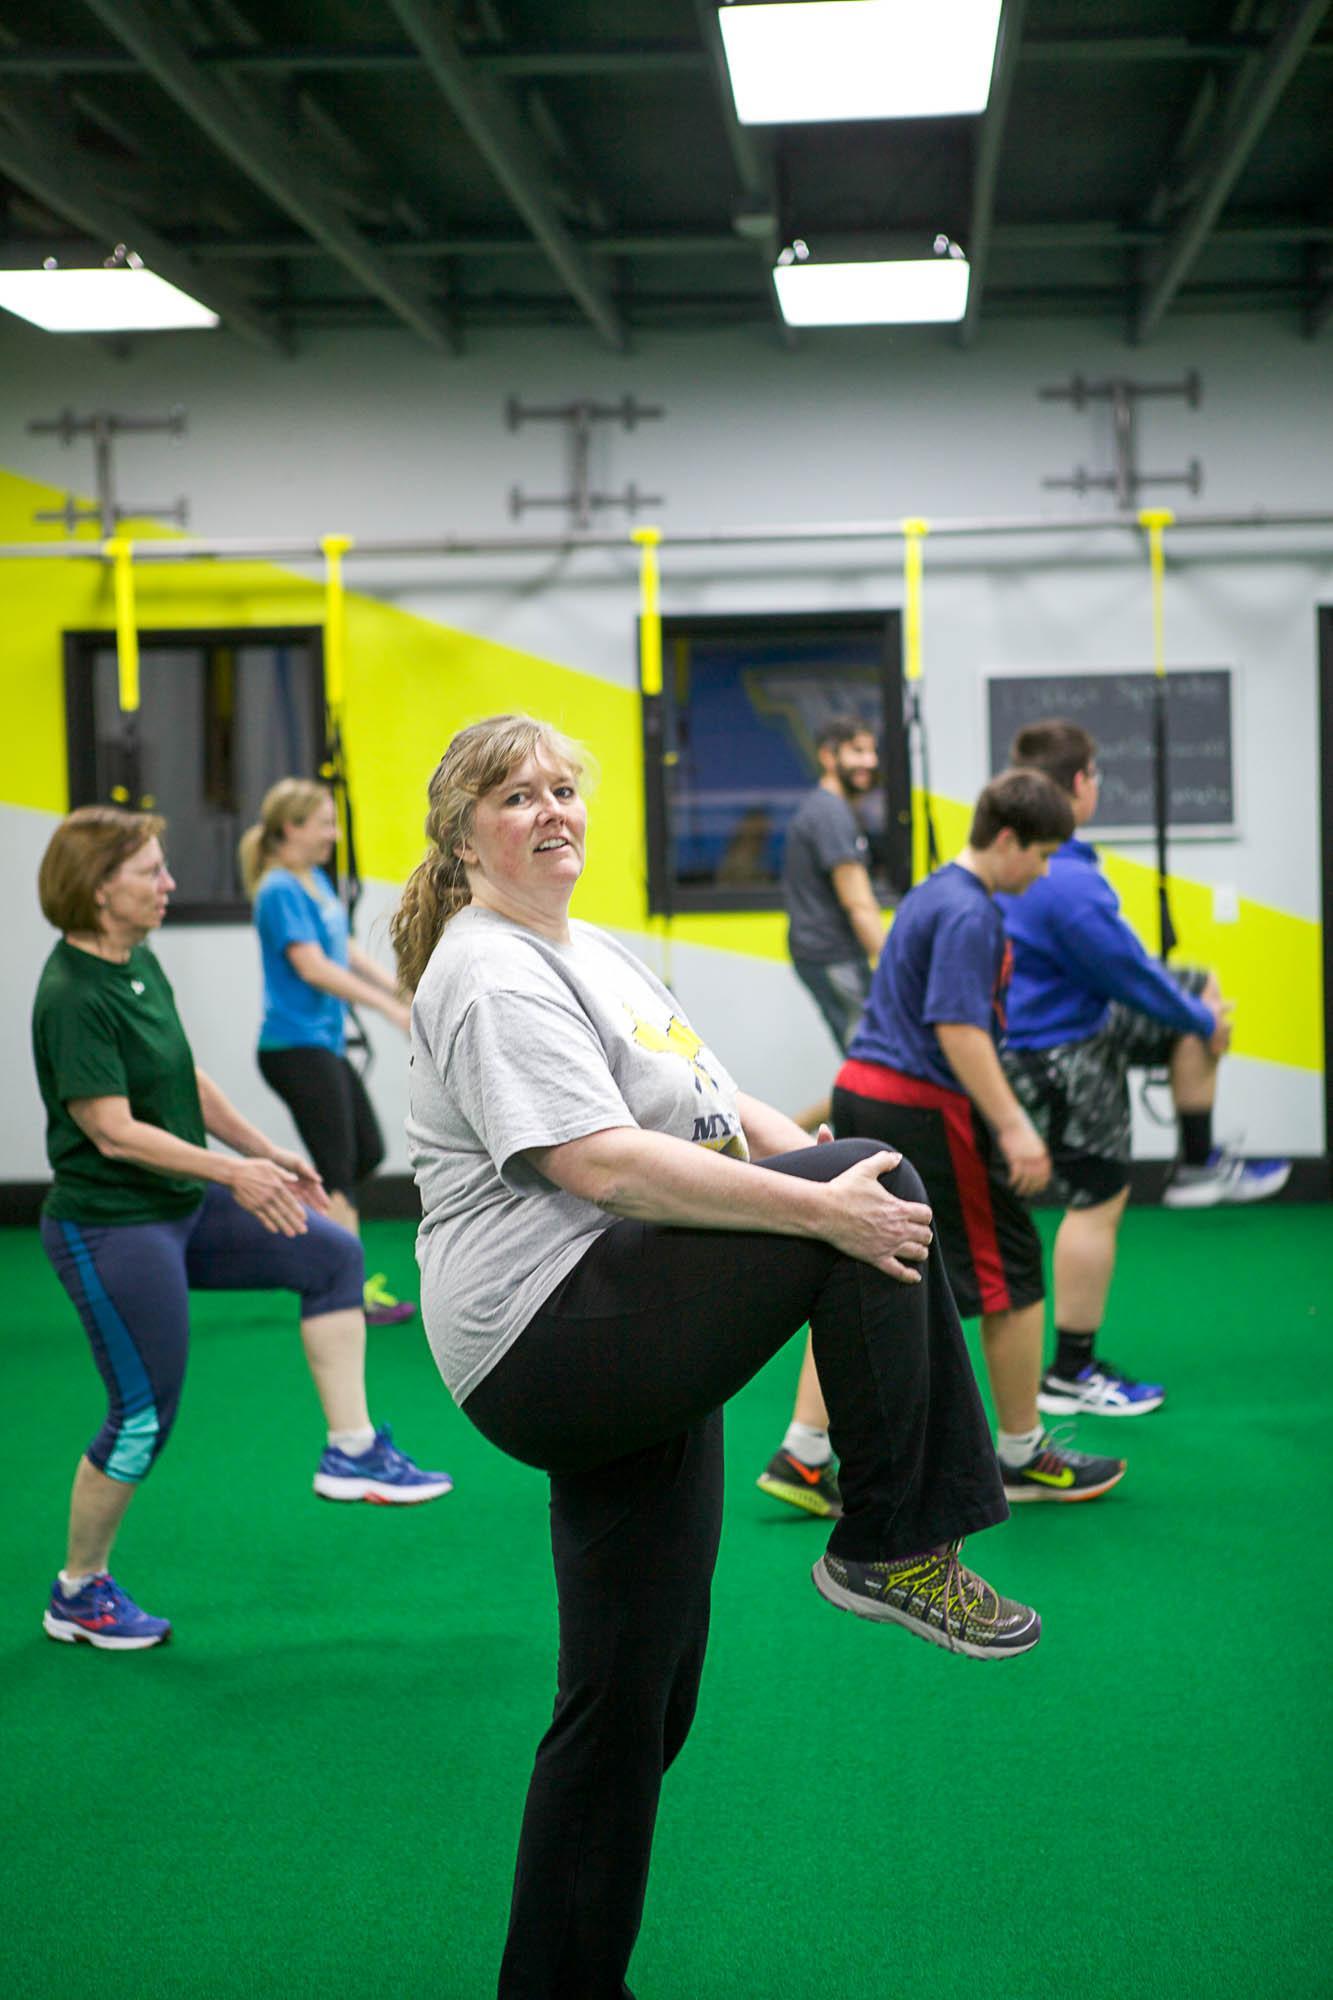 I.Q. Fitness & Wellness Center